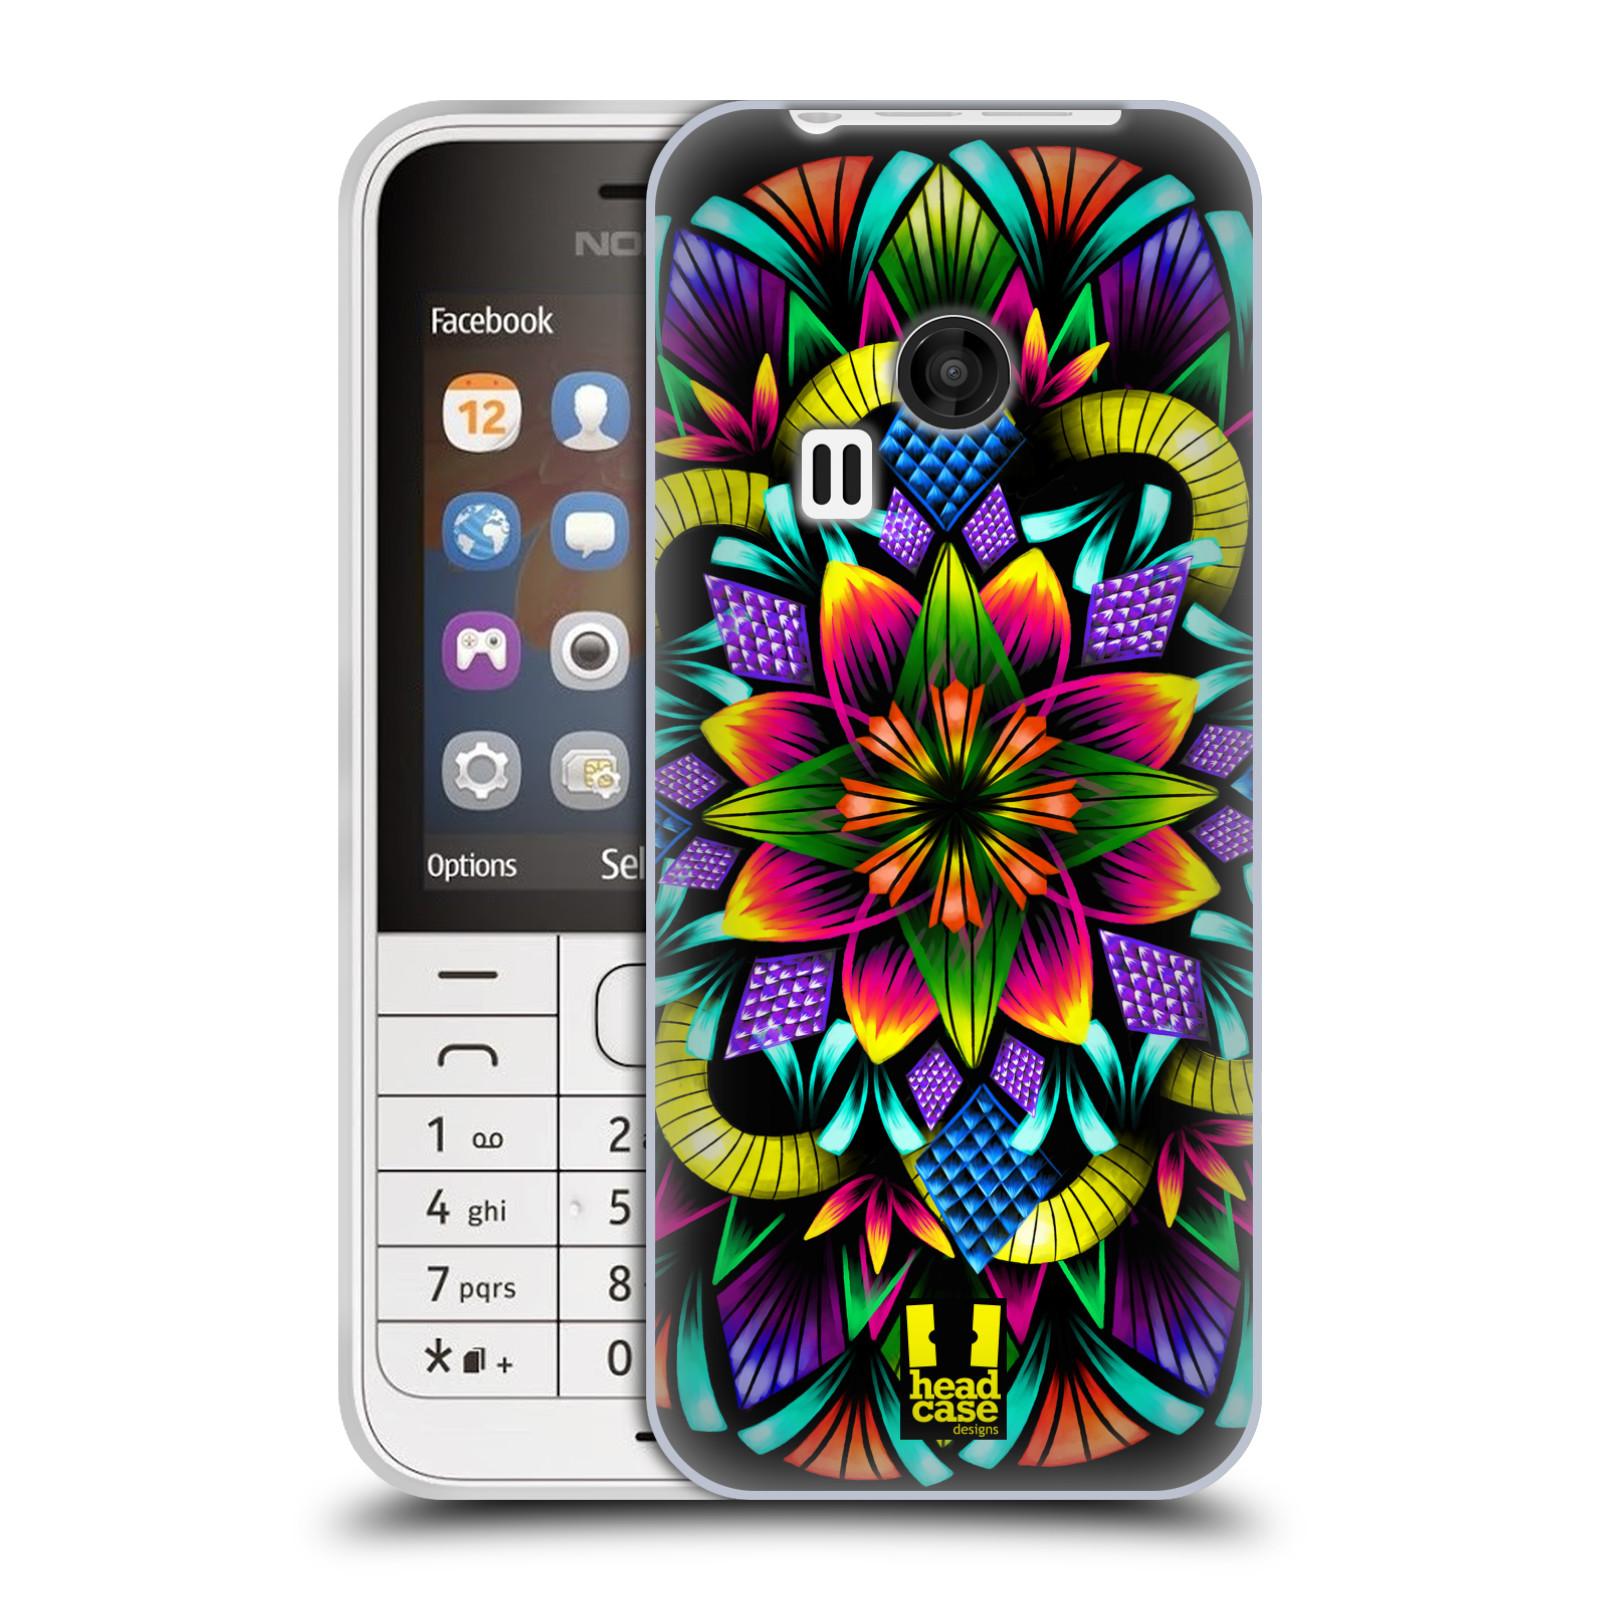 Silikonové pouzdro na mobil Nokia 220 HEAD CASE Květina mandala